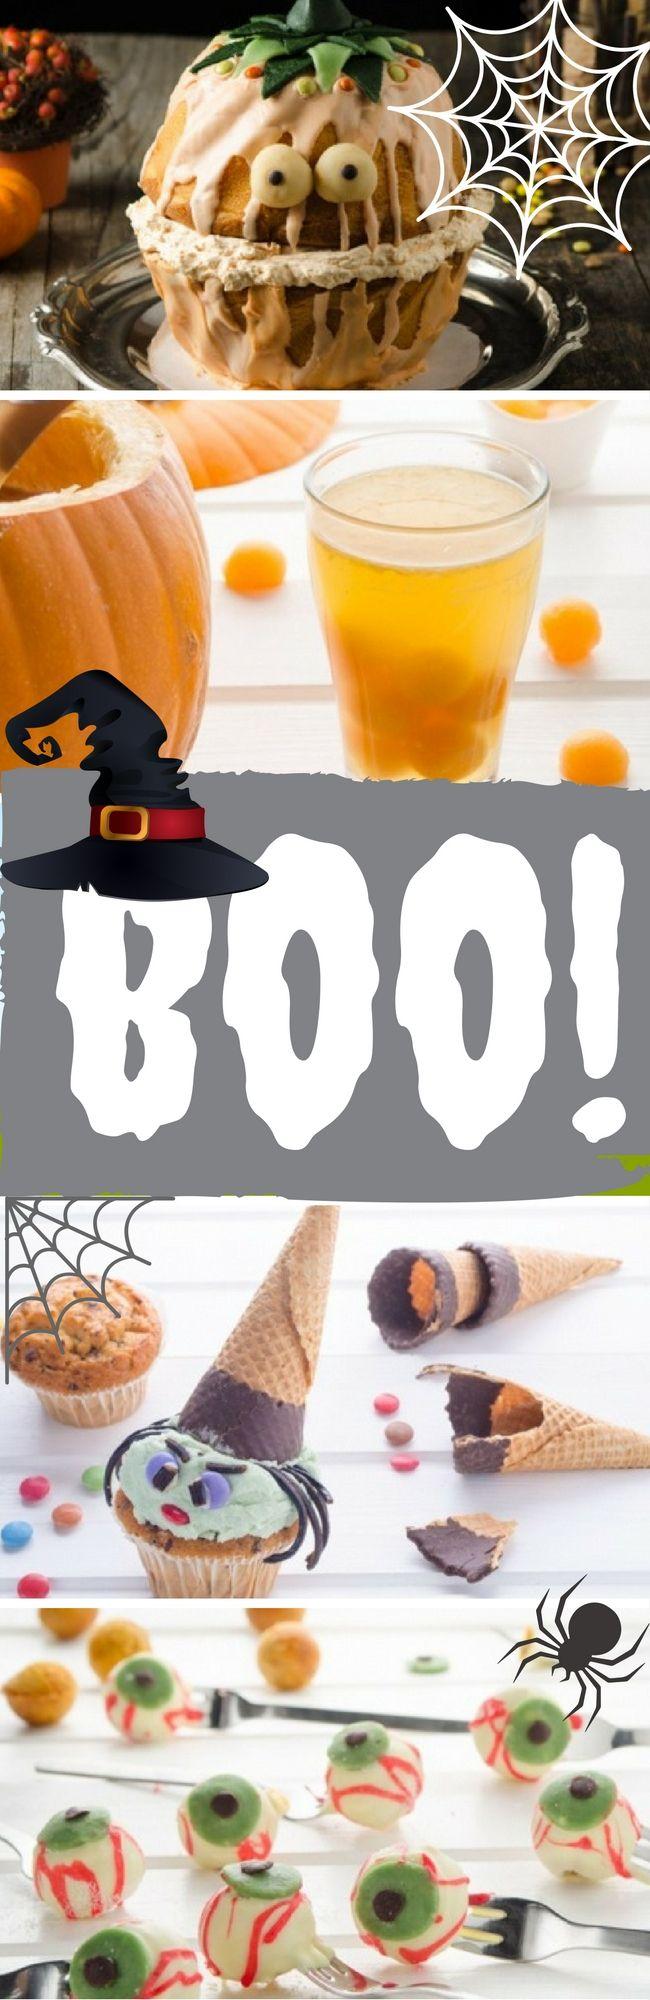 gute halloween rezepte beliebte gerichte und rezepte foto blog. Black Bedroom Furniture Sets. Home Design Ideas